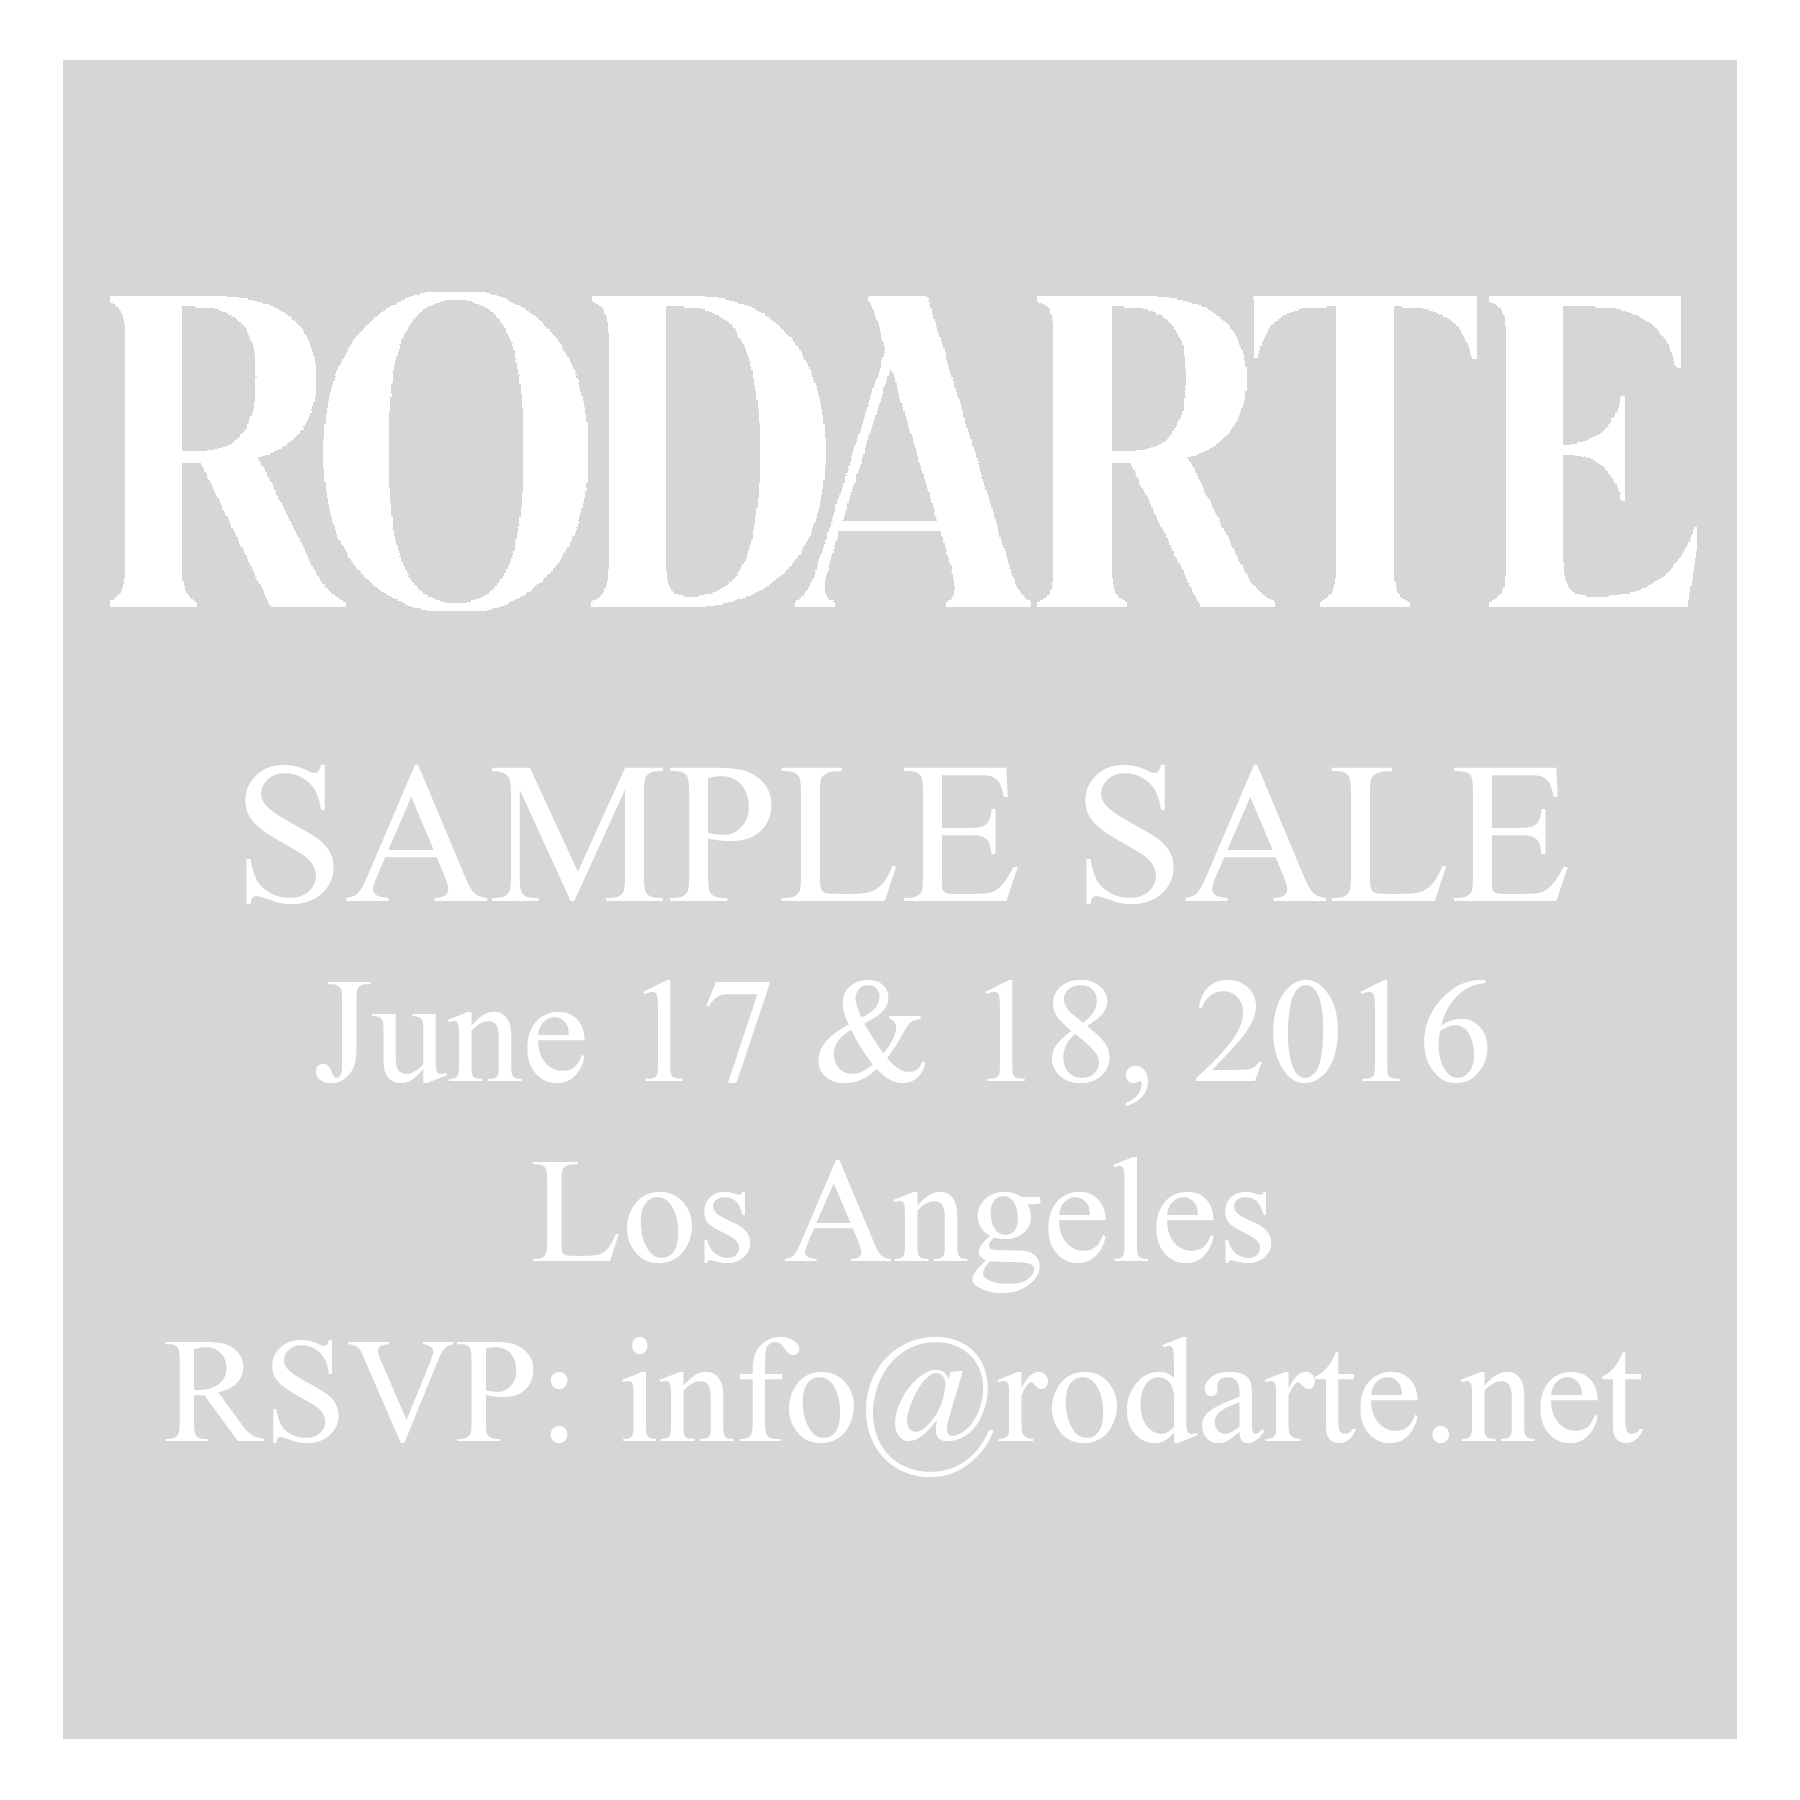 Racked La Rodartes Two Day La Sample Sale Starts This Friday Racked La